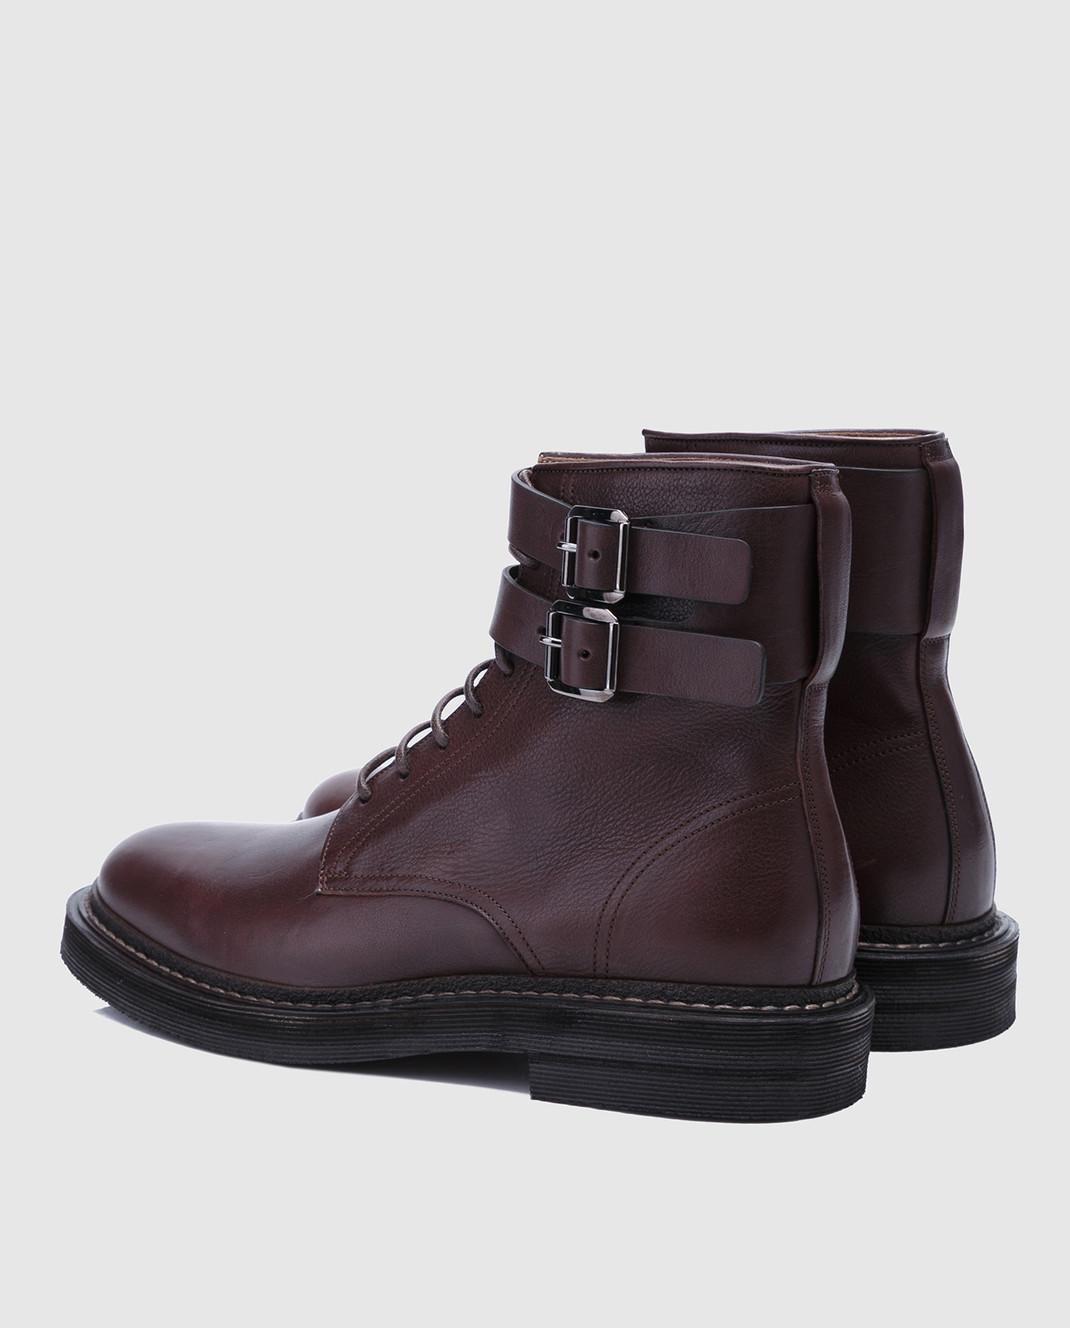 Brunello Cucinelli Темно-коричневые кожаные ботинки MZUSPFU174 изображение 3